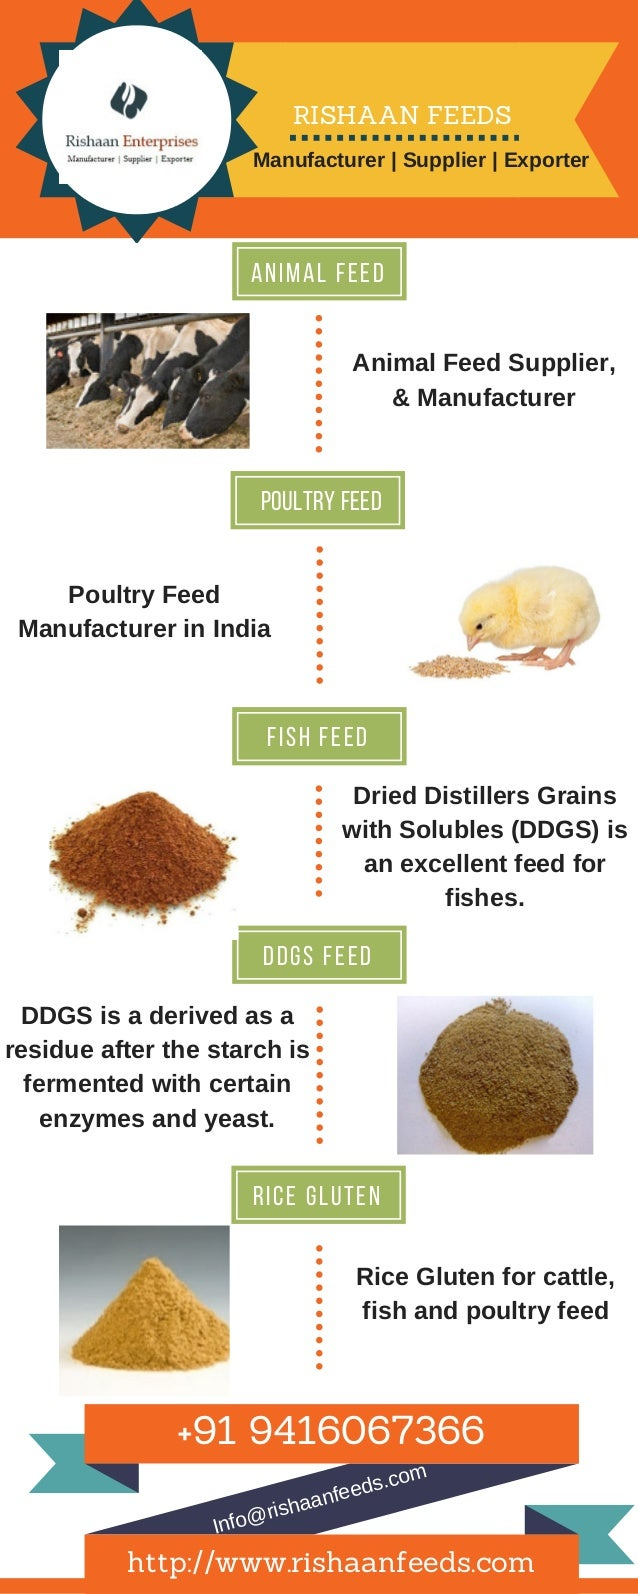 An i m a l F e e d poultry feed F i s h f e e d d d g s f e e d r i c e g l u t e n AnimalFeedSupplier, &Manufacturer P...